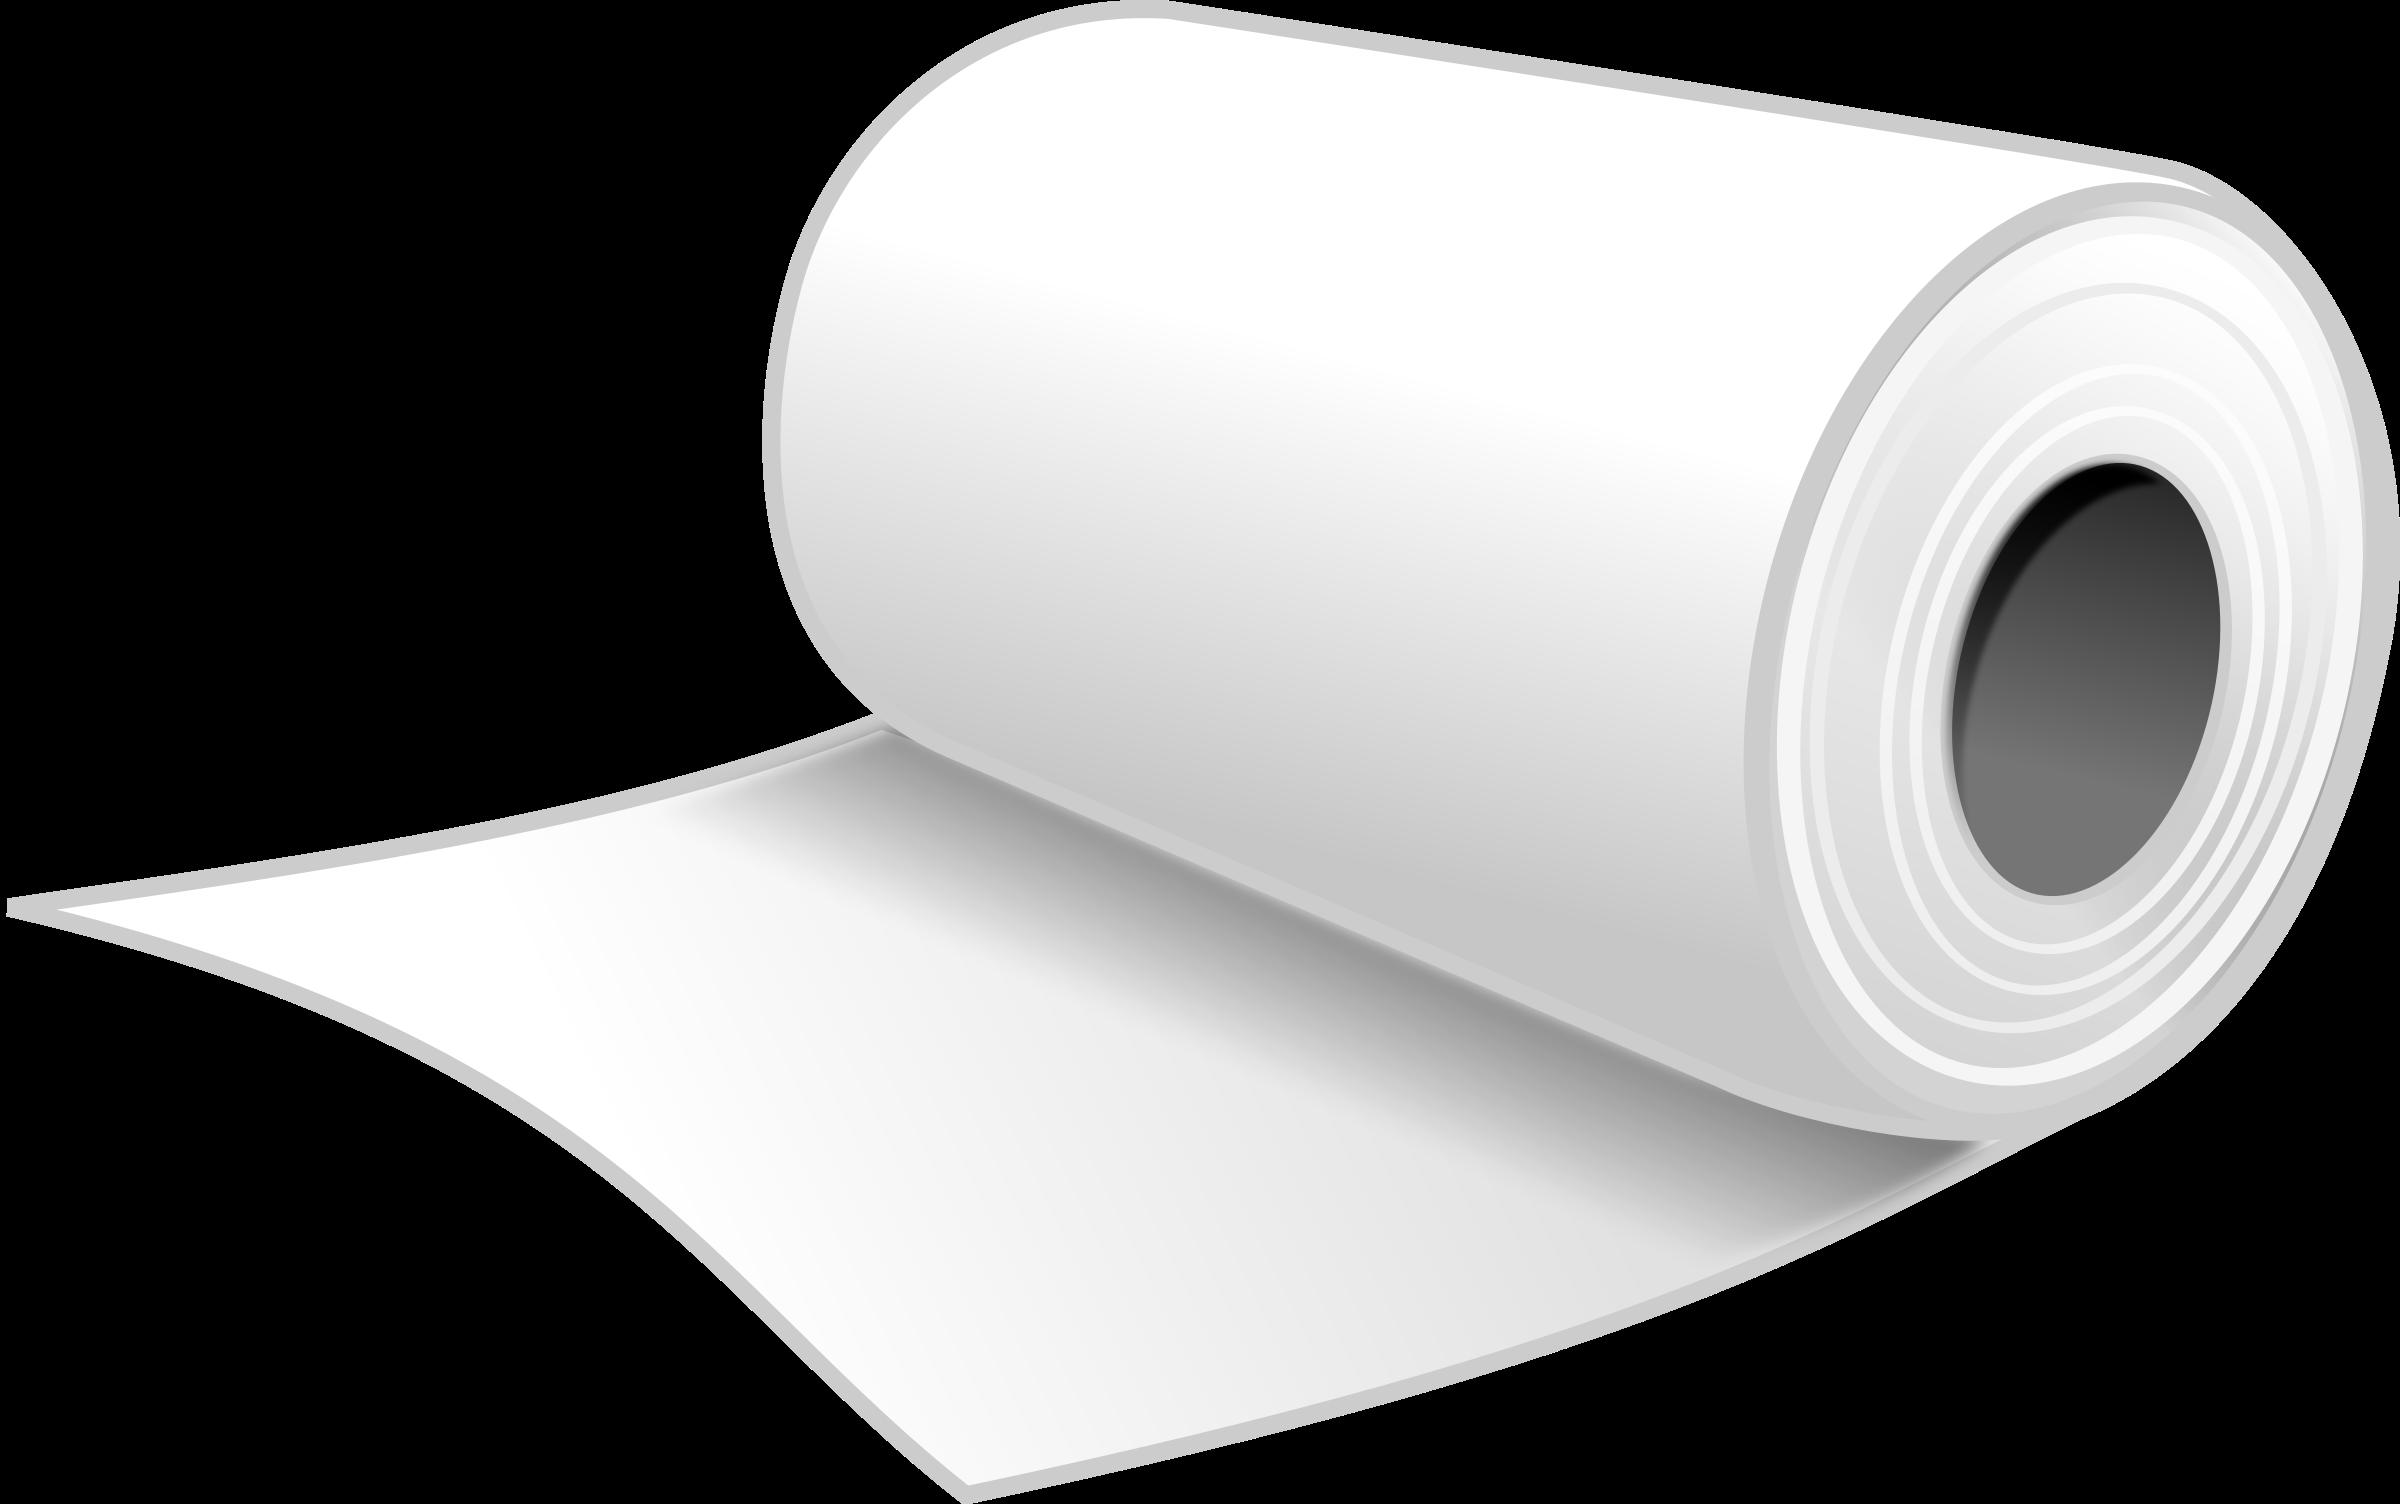 Paper clipart rolled Clip Paper Paper art Clipart